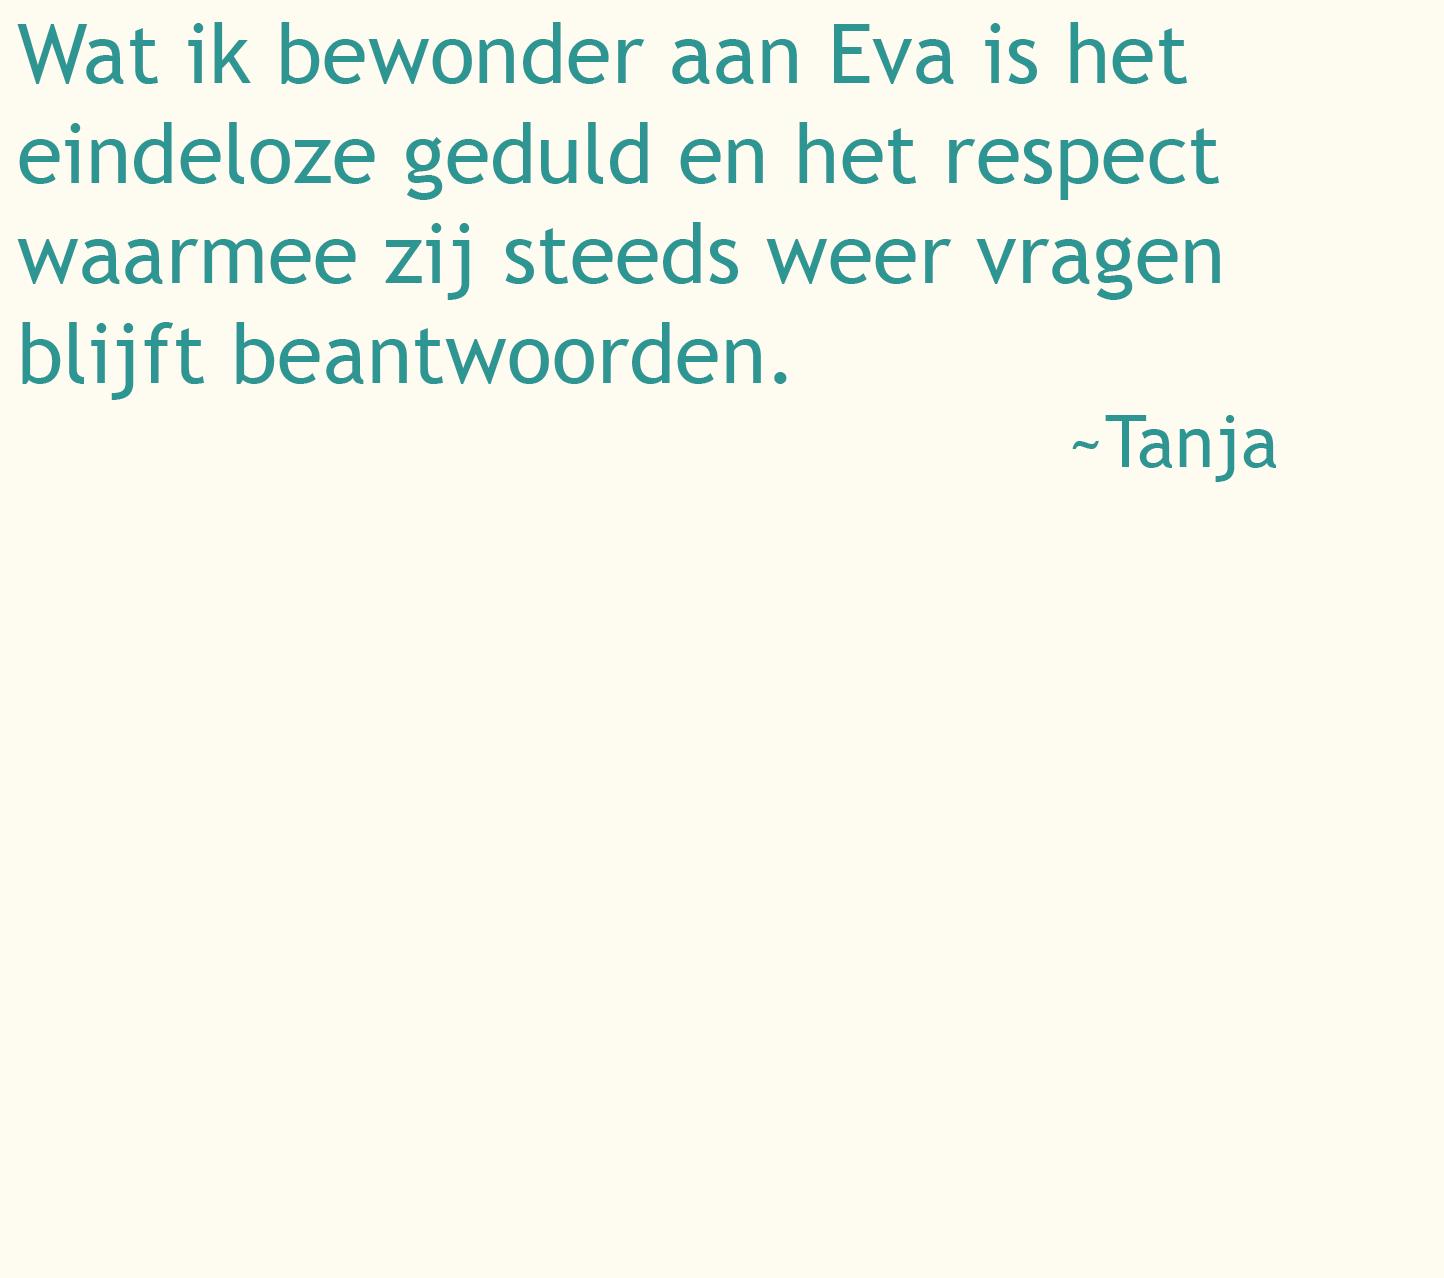 Tanja.png